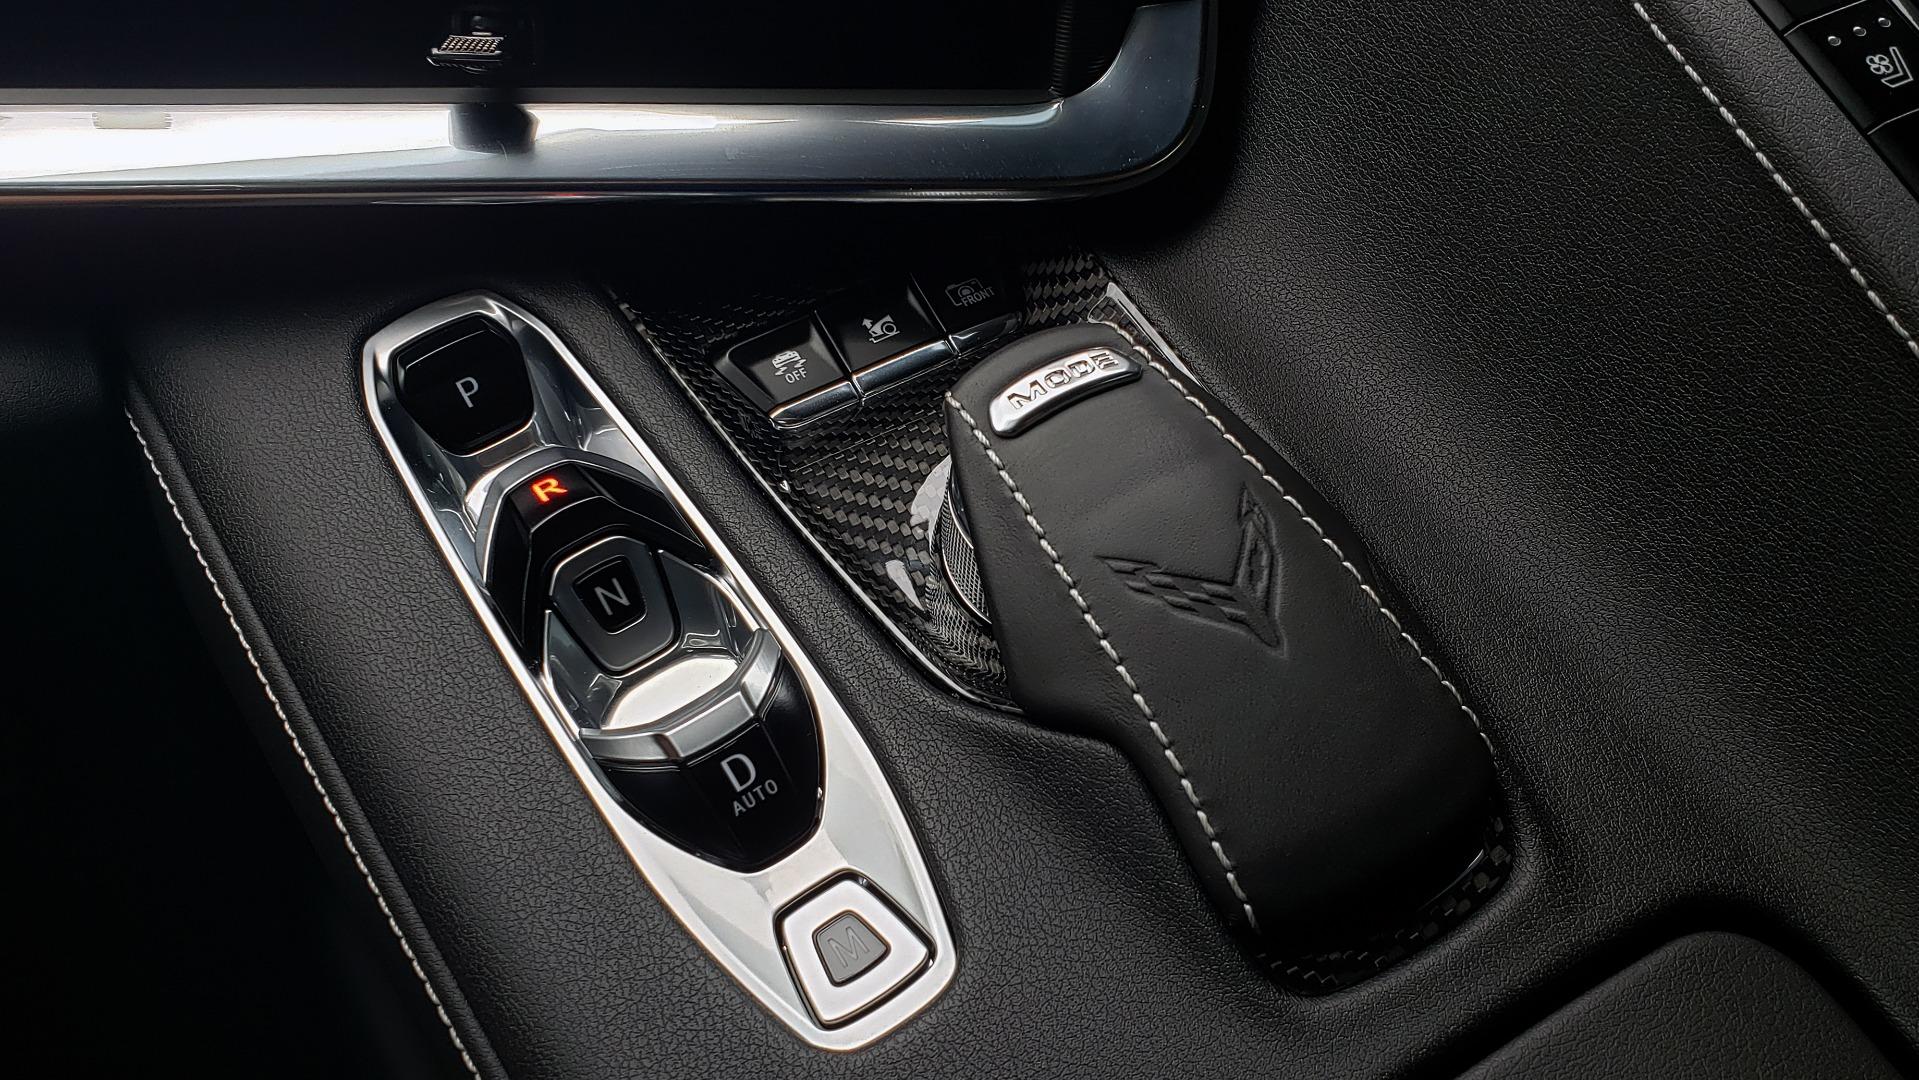 Used 2020 Chevrolet CORVETTE C8 STINGRAY 2LT / 6.2L V8 / 8-SPD AUTO / NAV / BOSE / REARVIEW / DATA RECOR for sale Sold at Formula Imports in Charlotte NC 28227 57